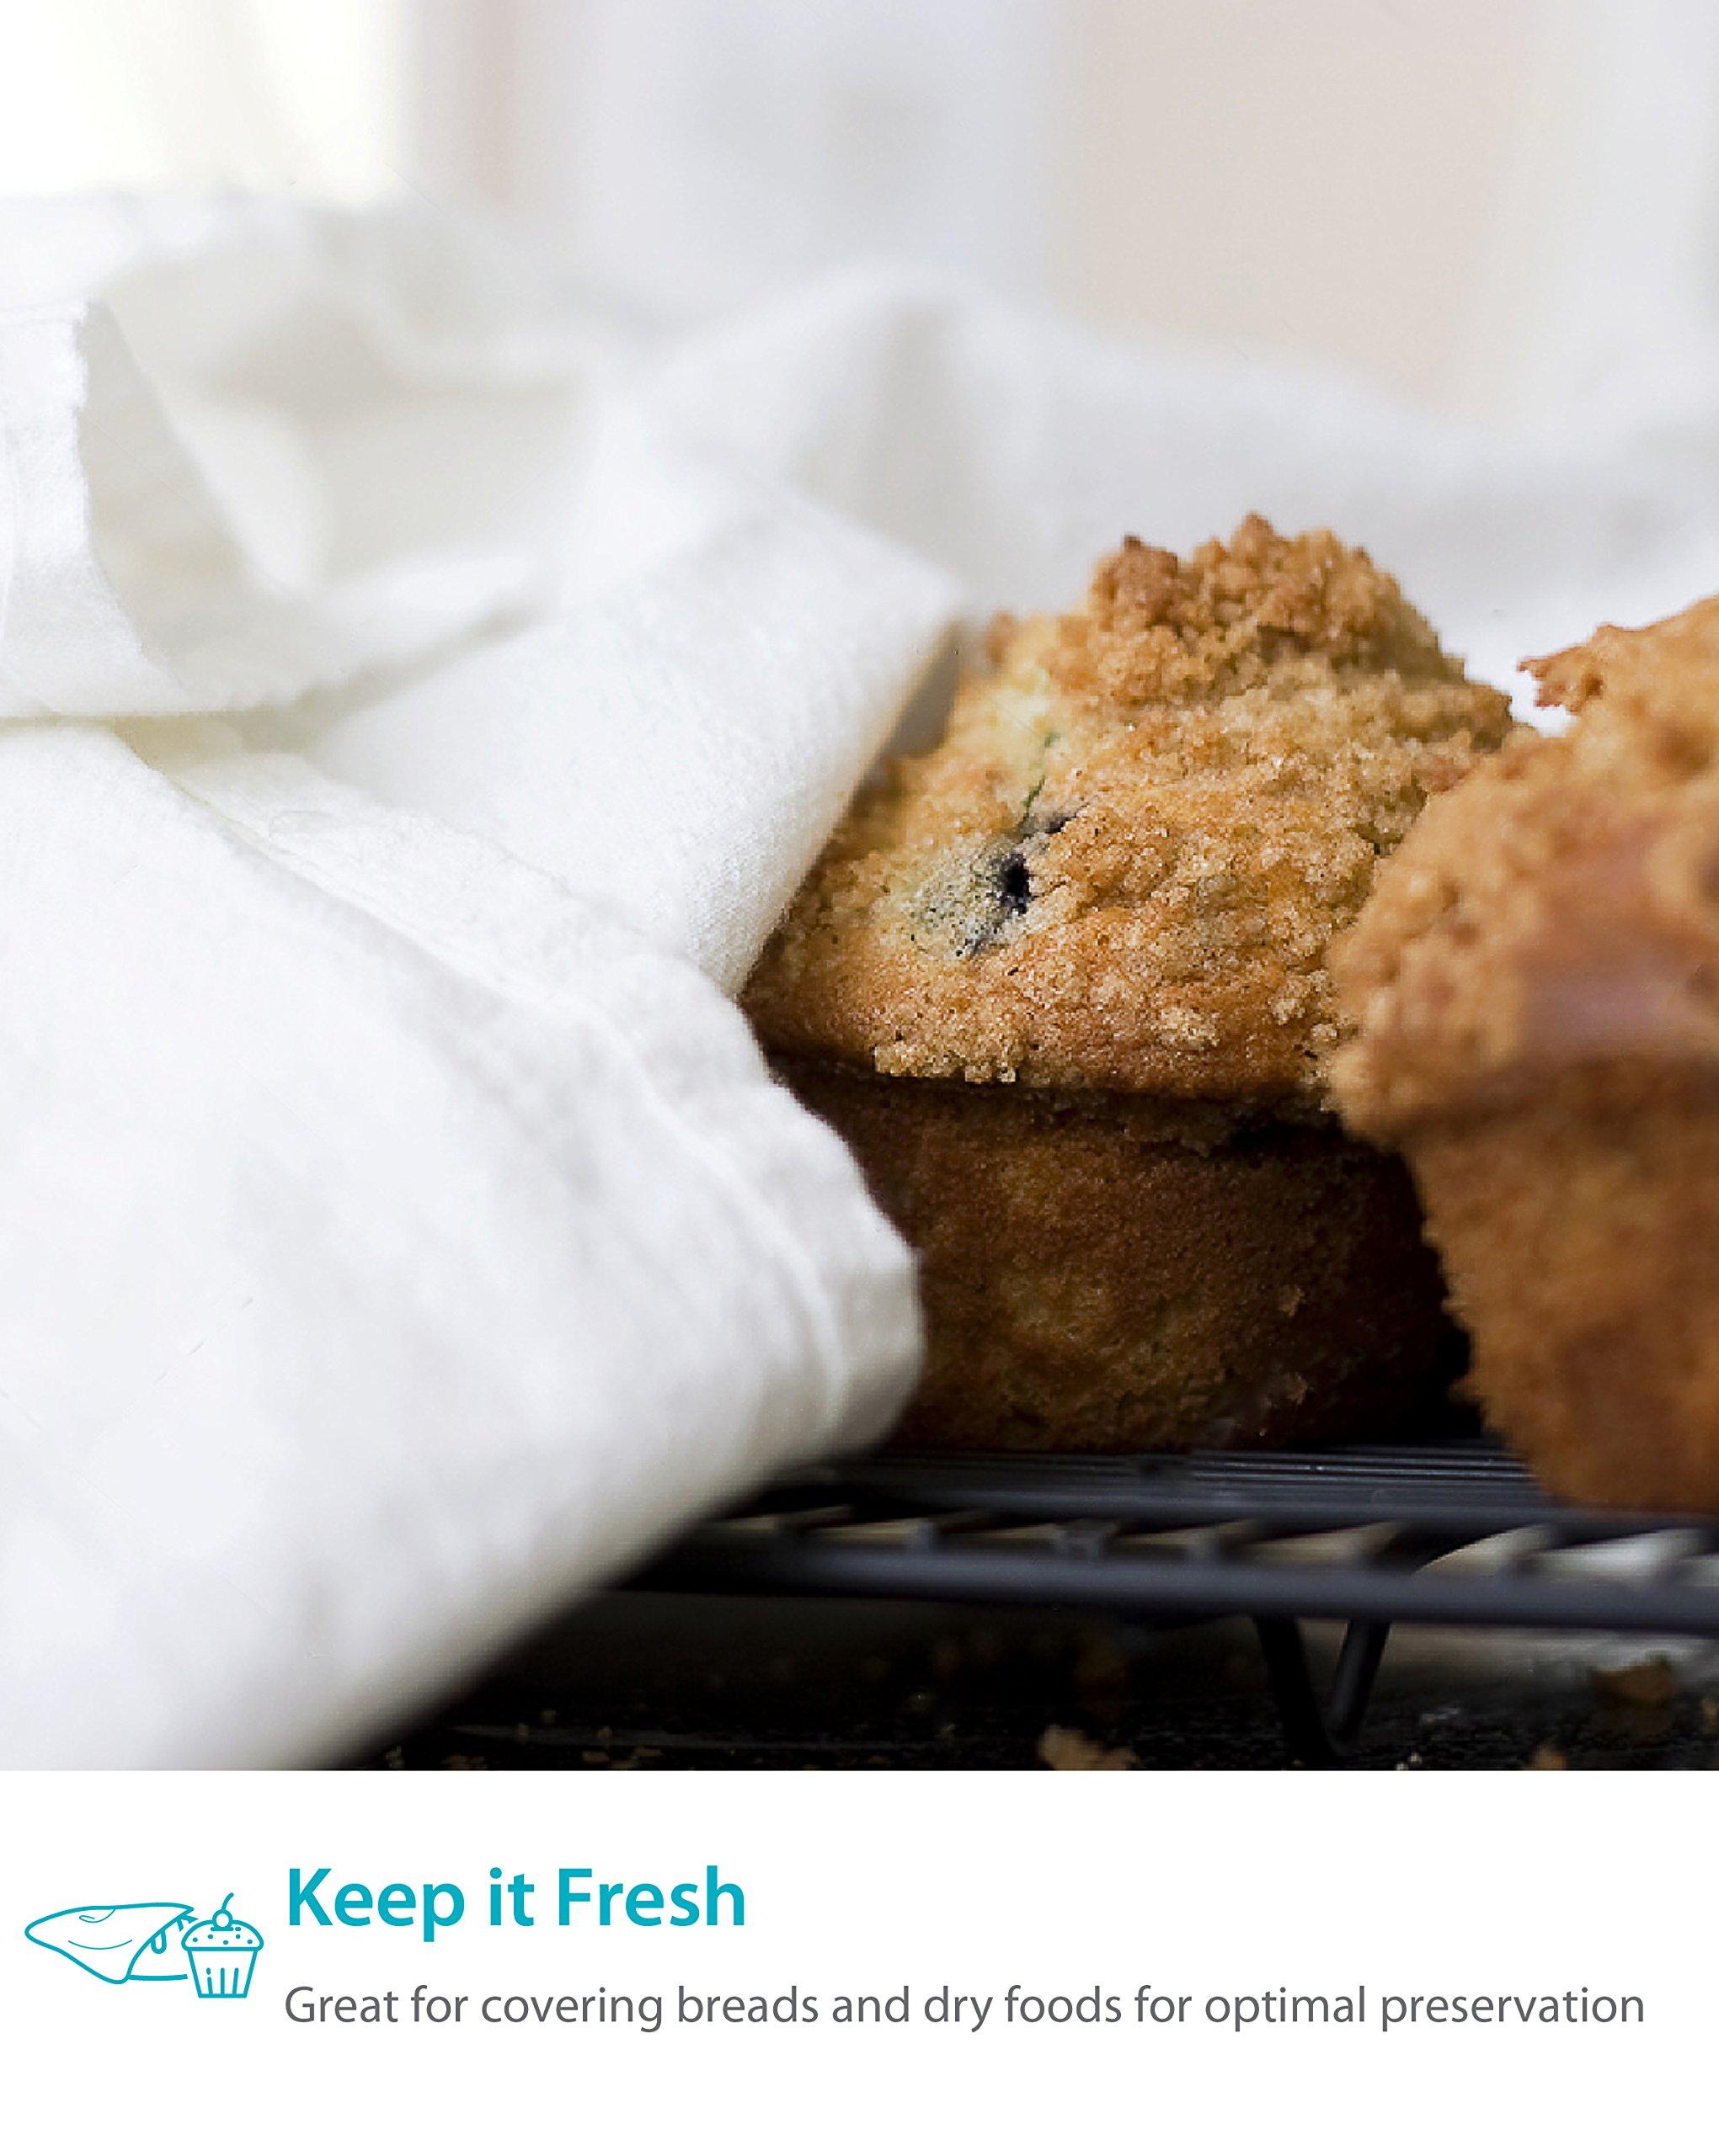 Zeppoli 12-Pack Flour Sack Towels - 31'' x 31'' Kitchen Towels - Absorbent White Dish Towels - 100% Ring Spun Cotton Bar Towels by Zeppoli (Image #6)